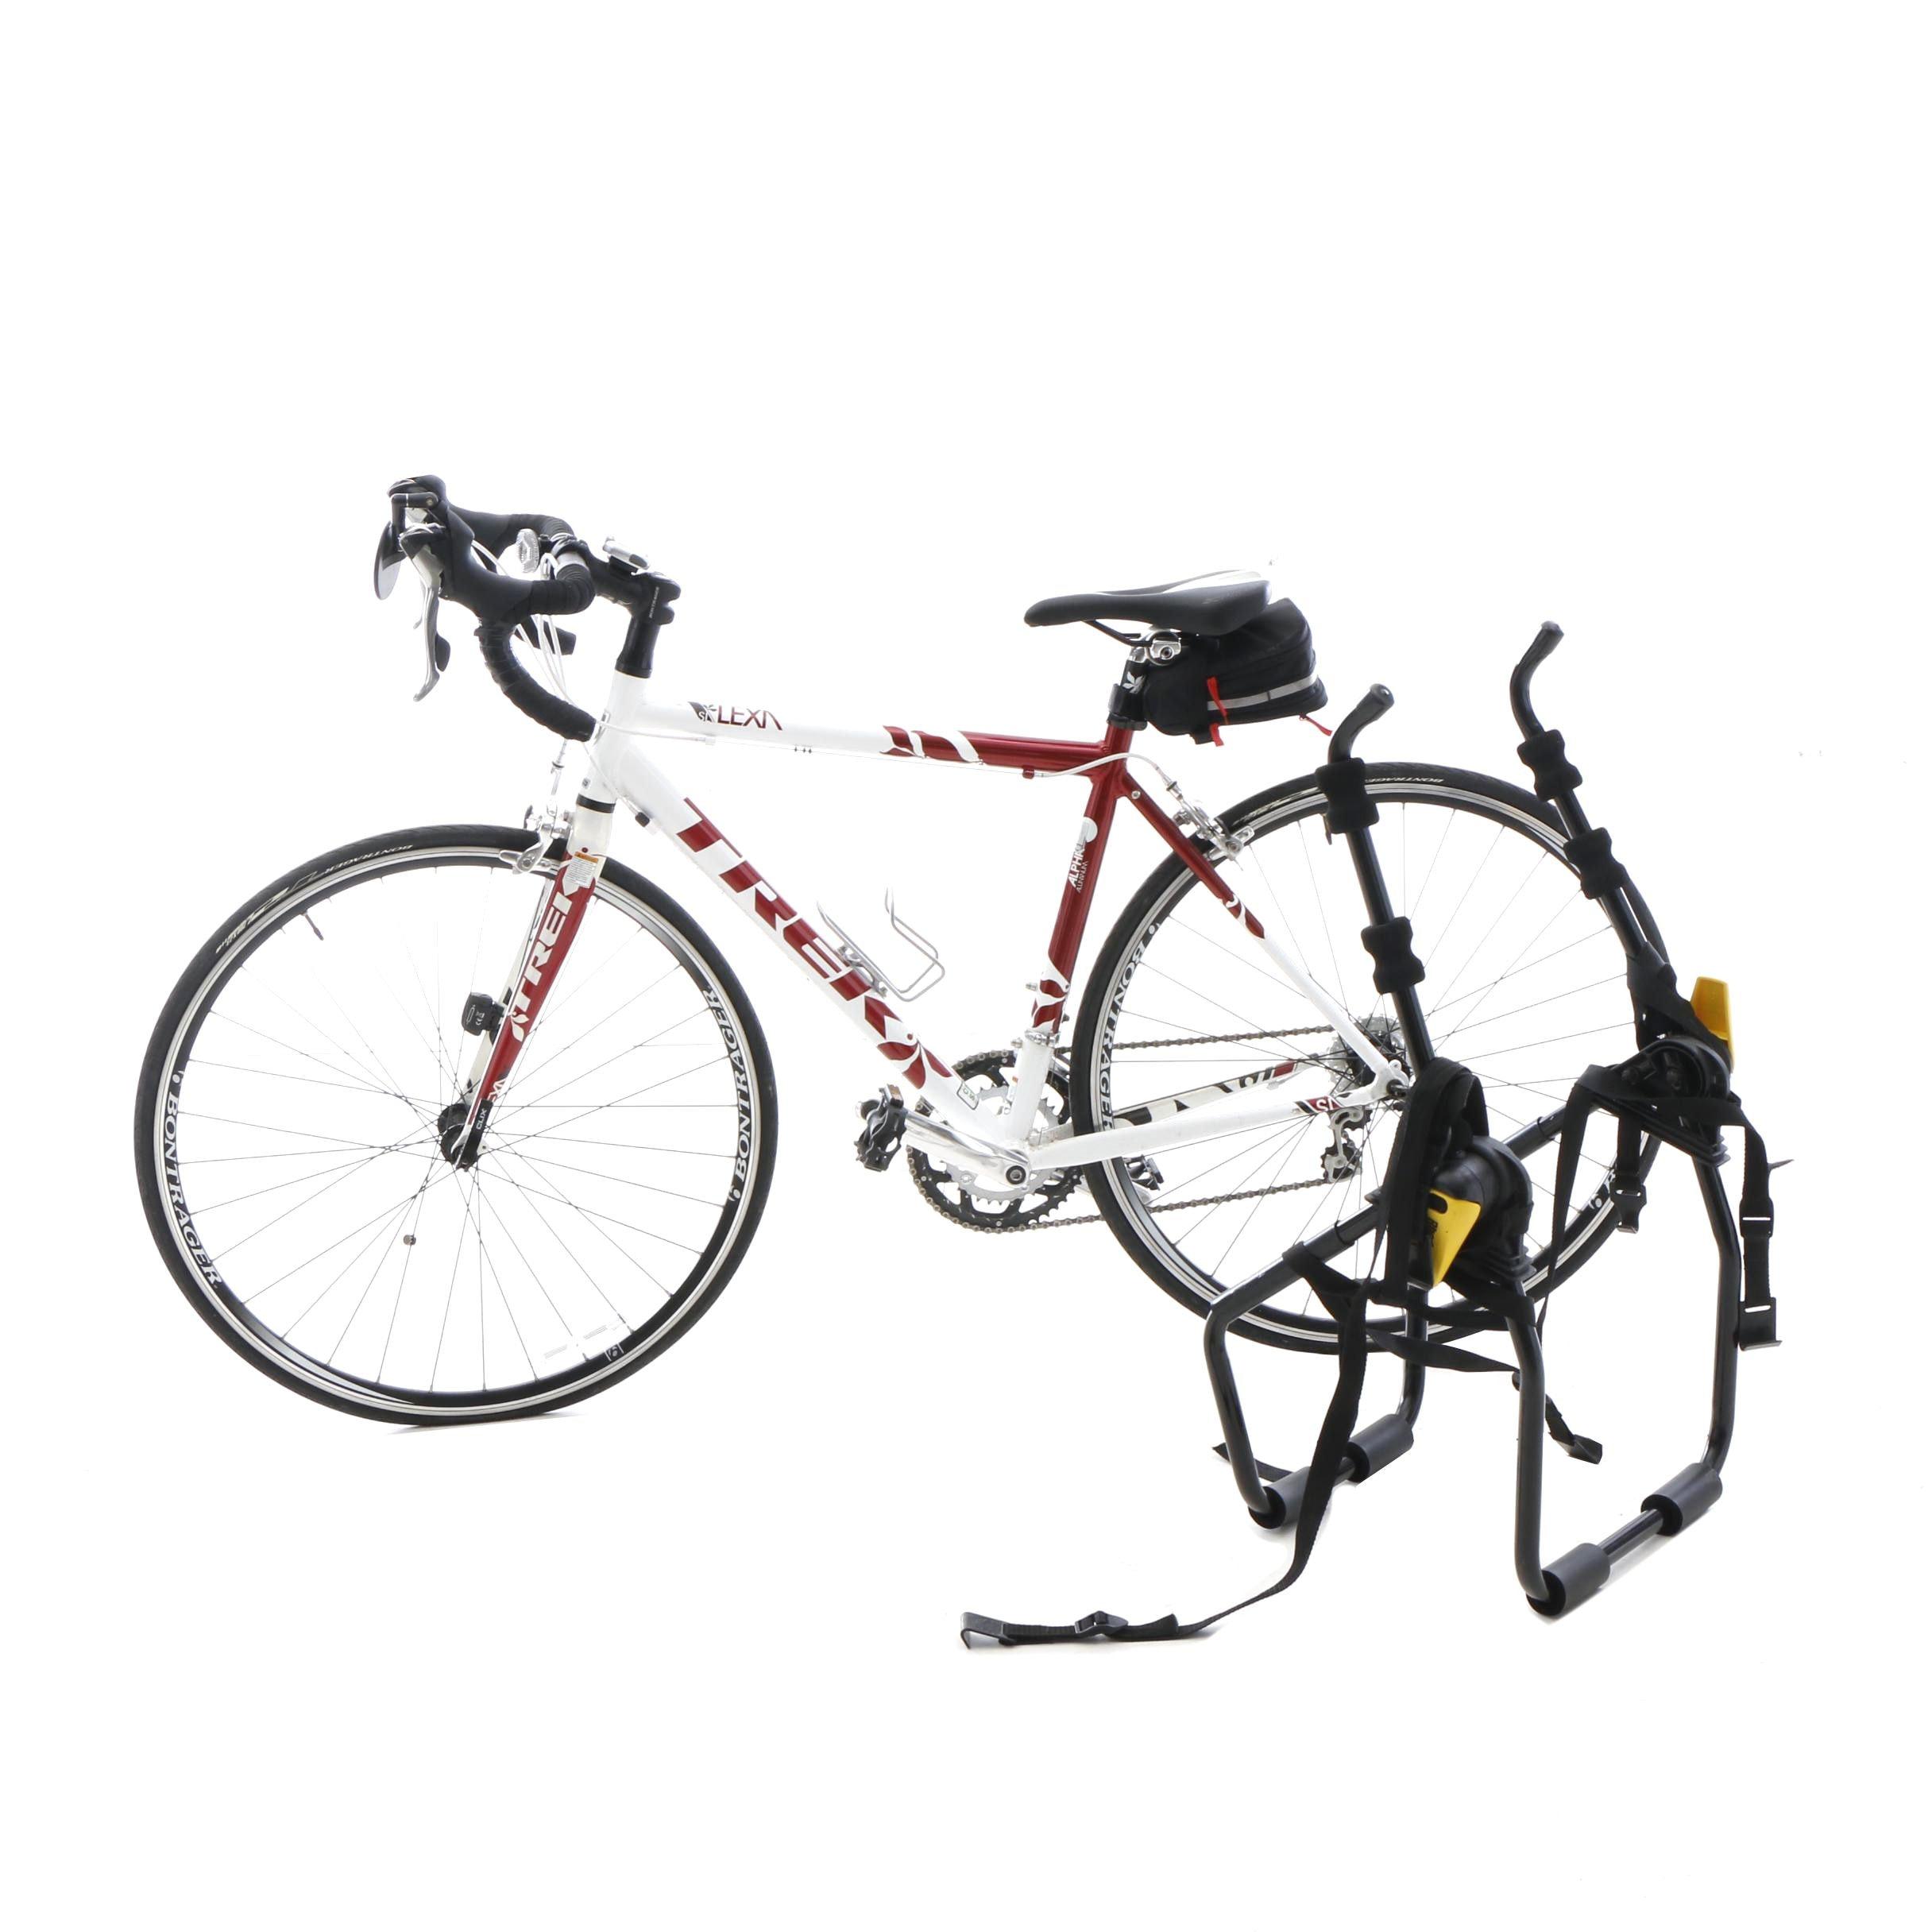 Bontrega Women's Road Bike and Accessories